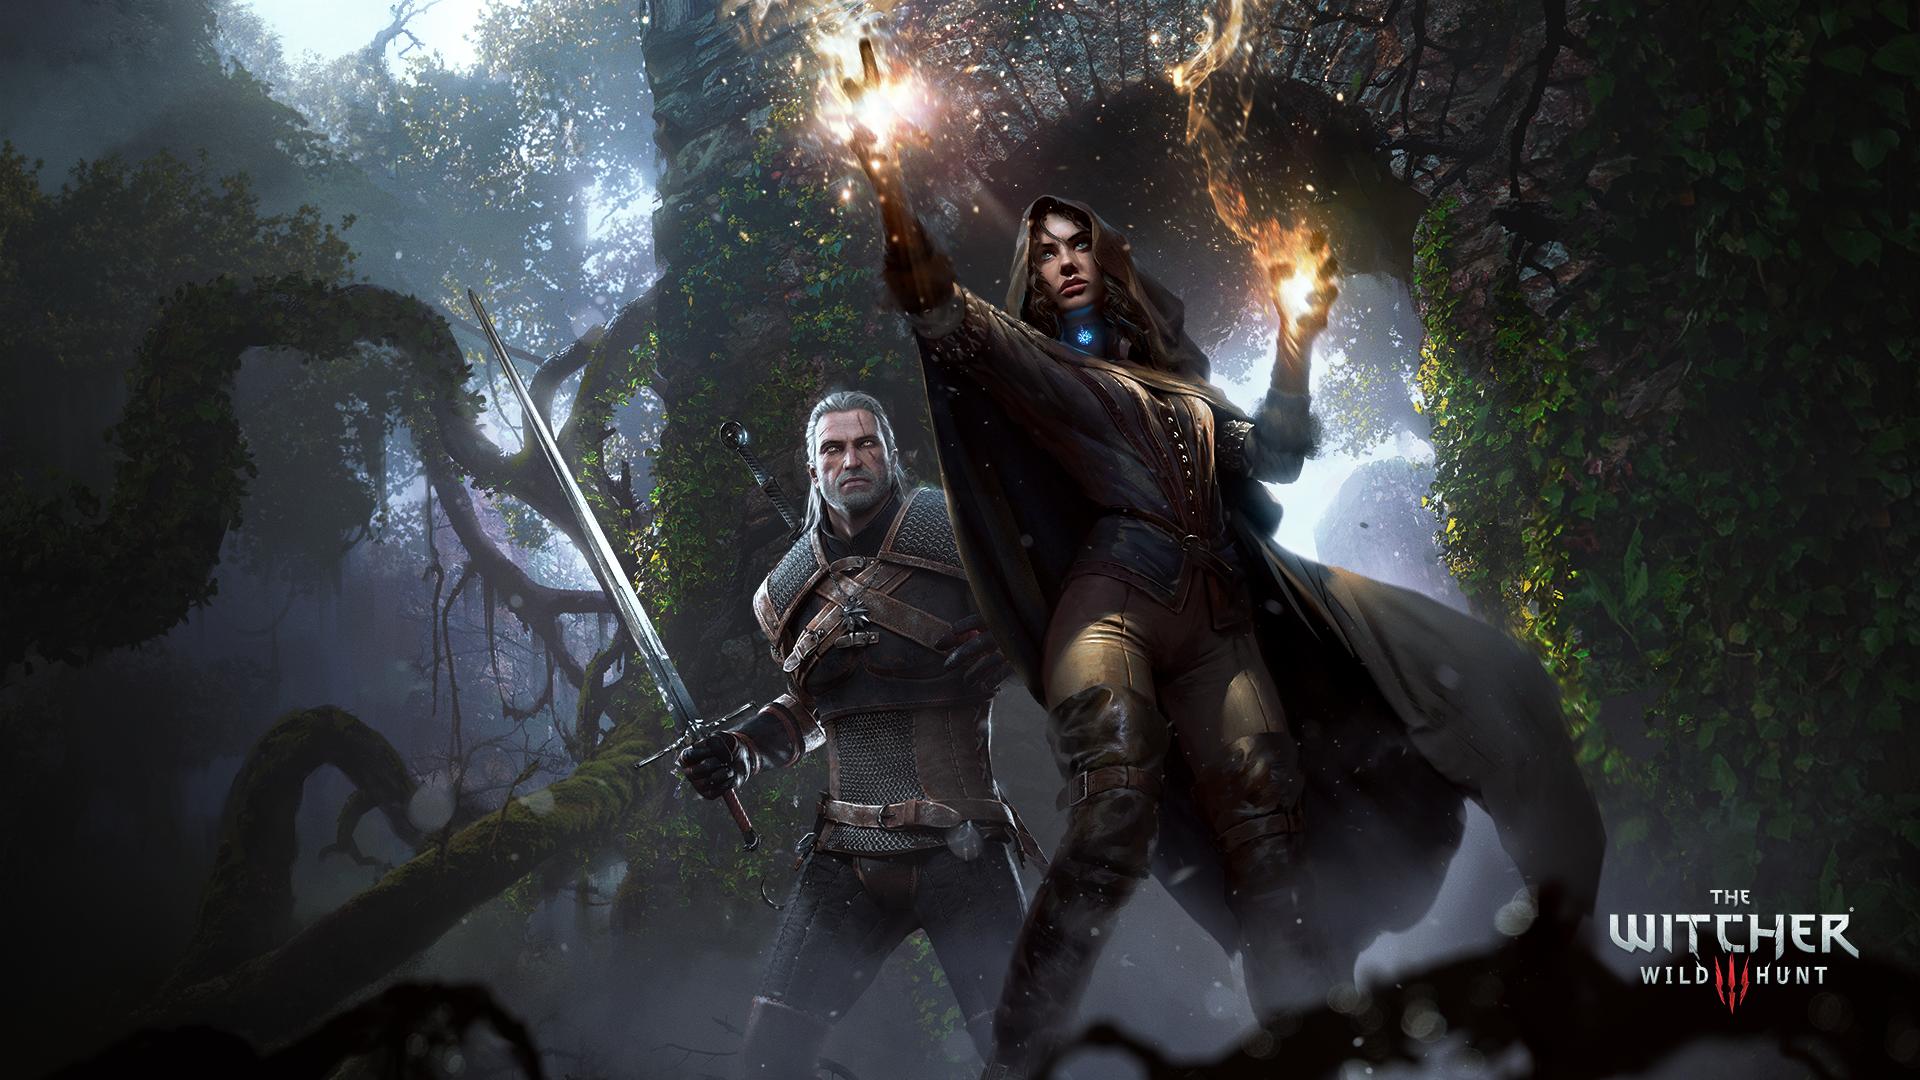 Geralt_Yennefer-size_1920x1080.png